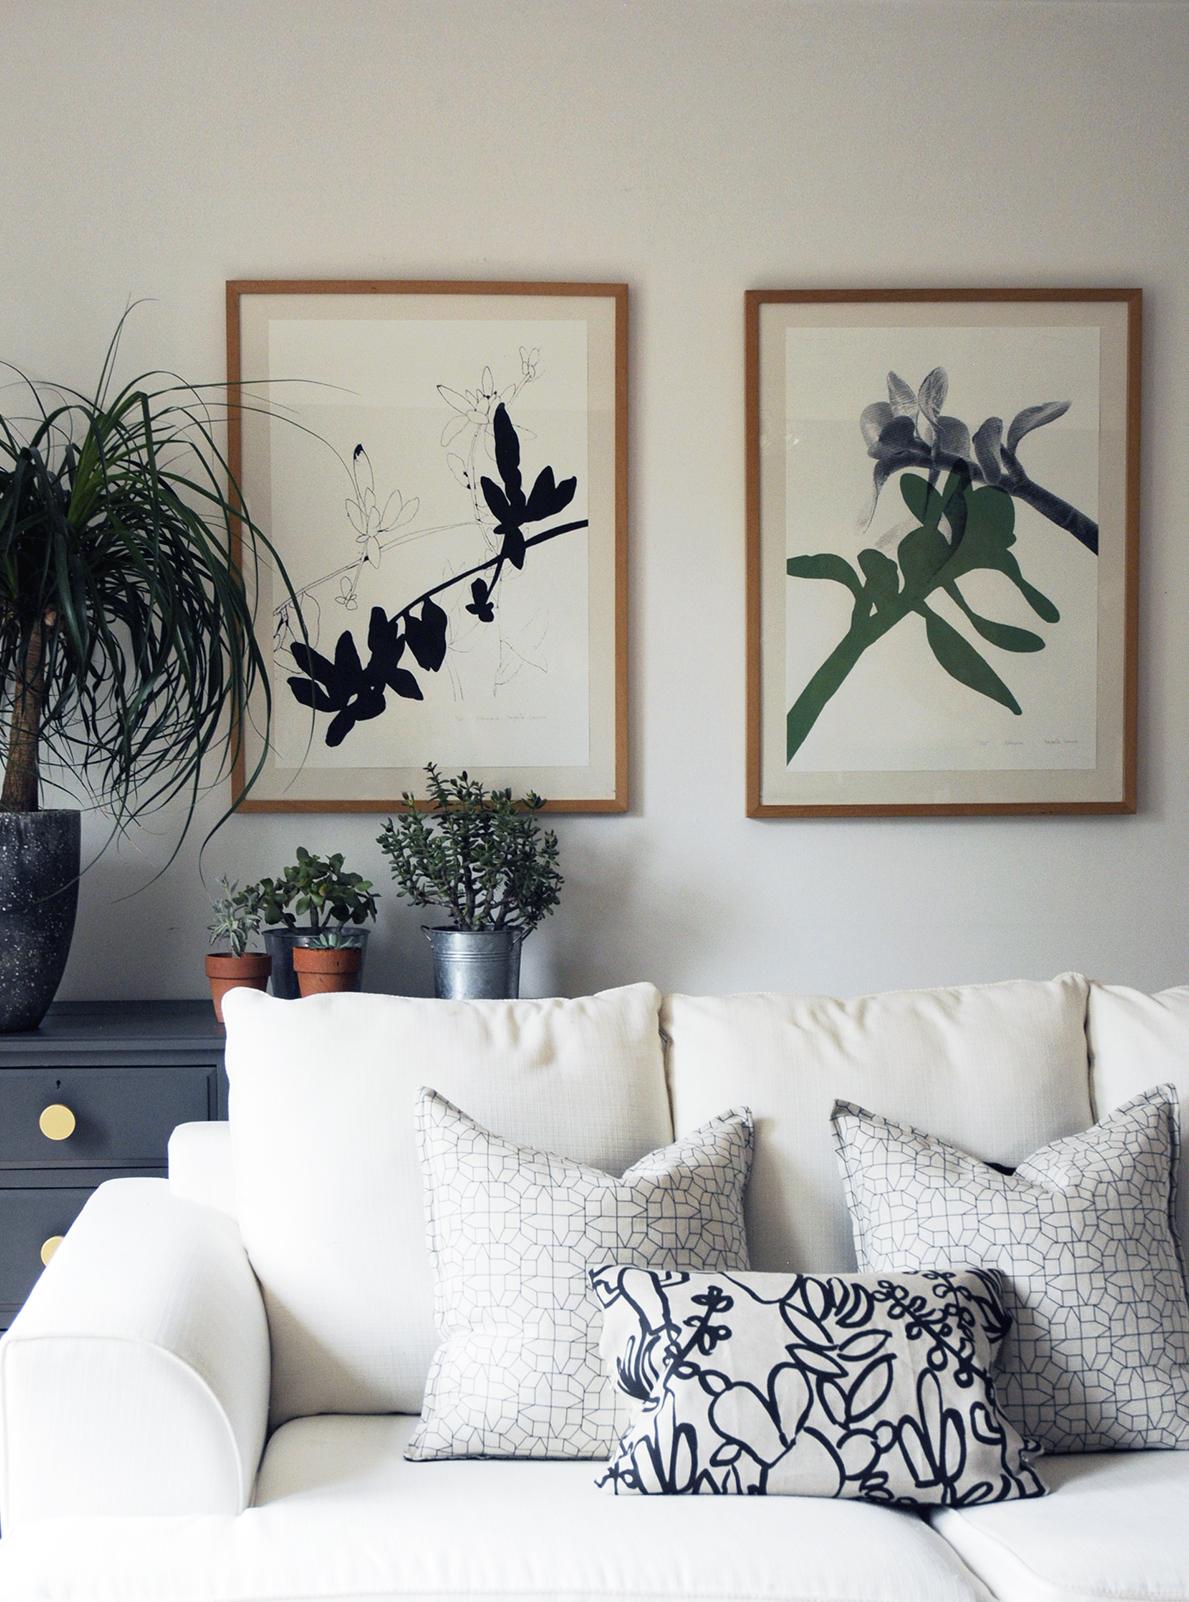 Drawing Room Furniture Design: Botanical Art Print, Wall Art, Black, White And Green